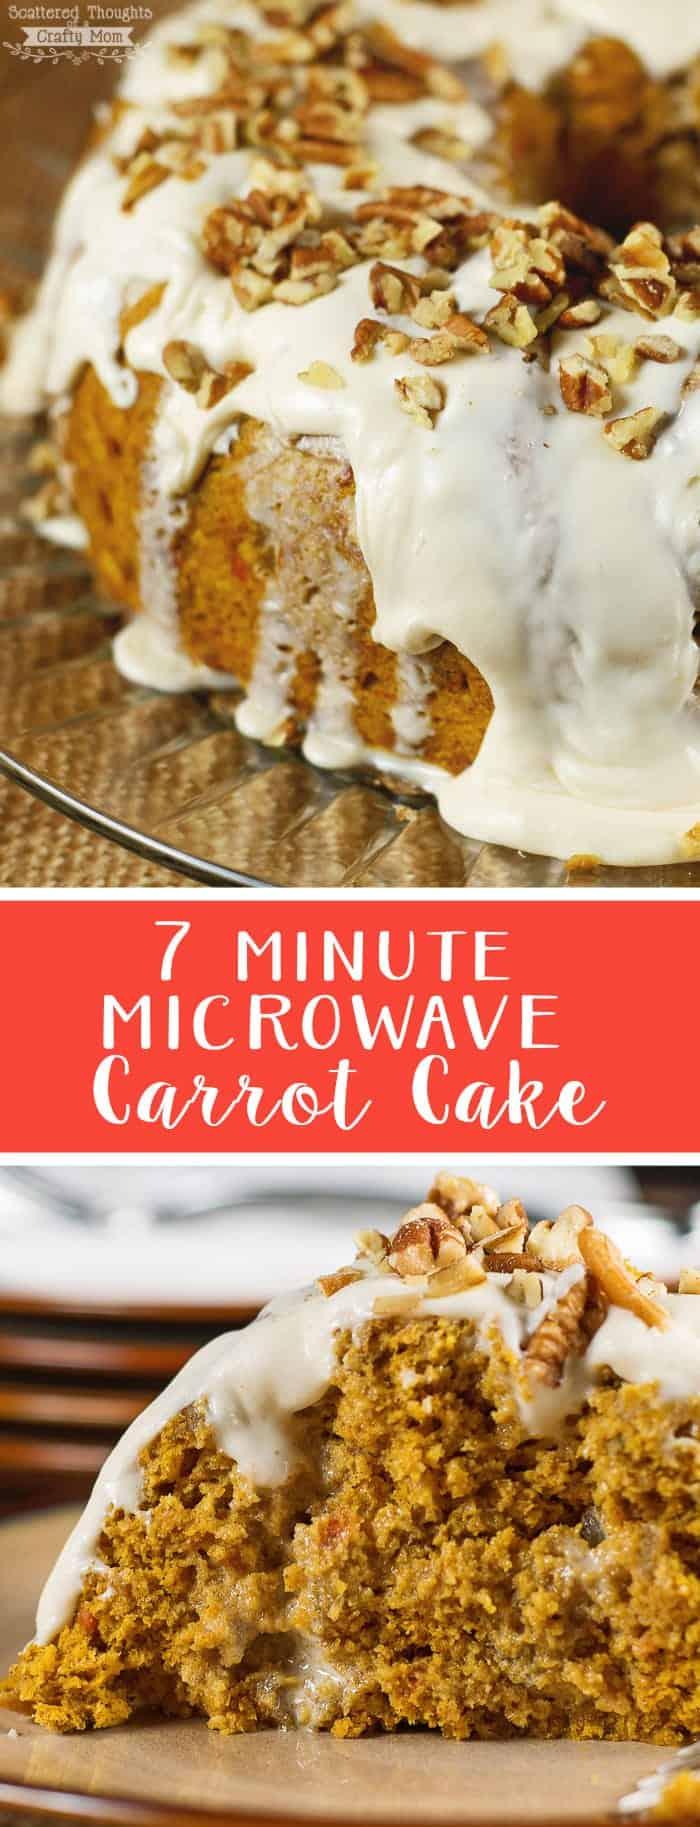 Super simple 7 Minute Microwave Carrot Cake Recipe.